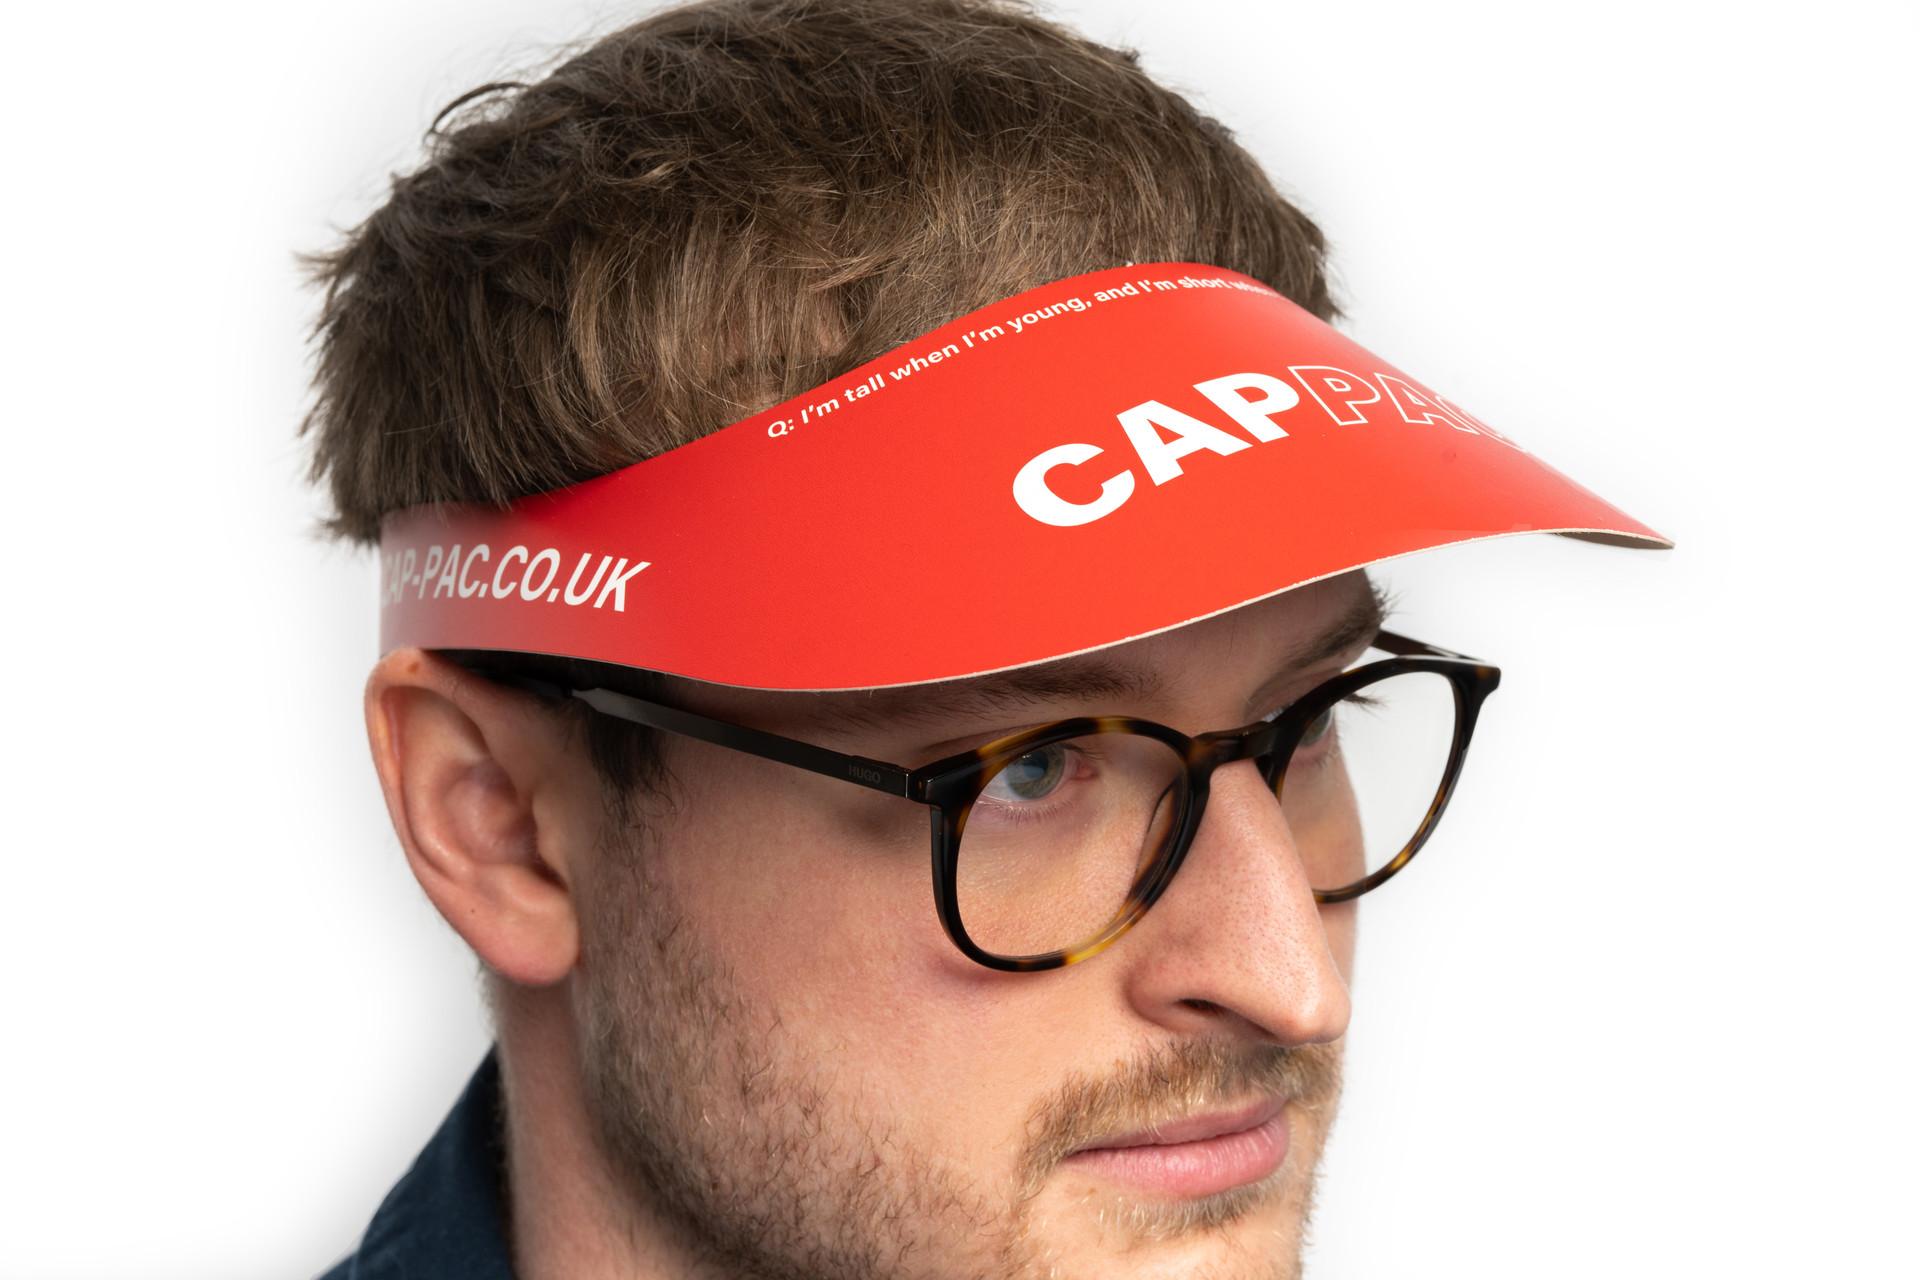 CapPac-002.jpg